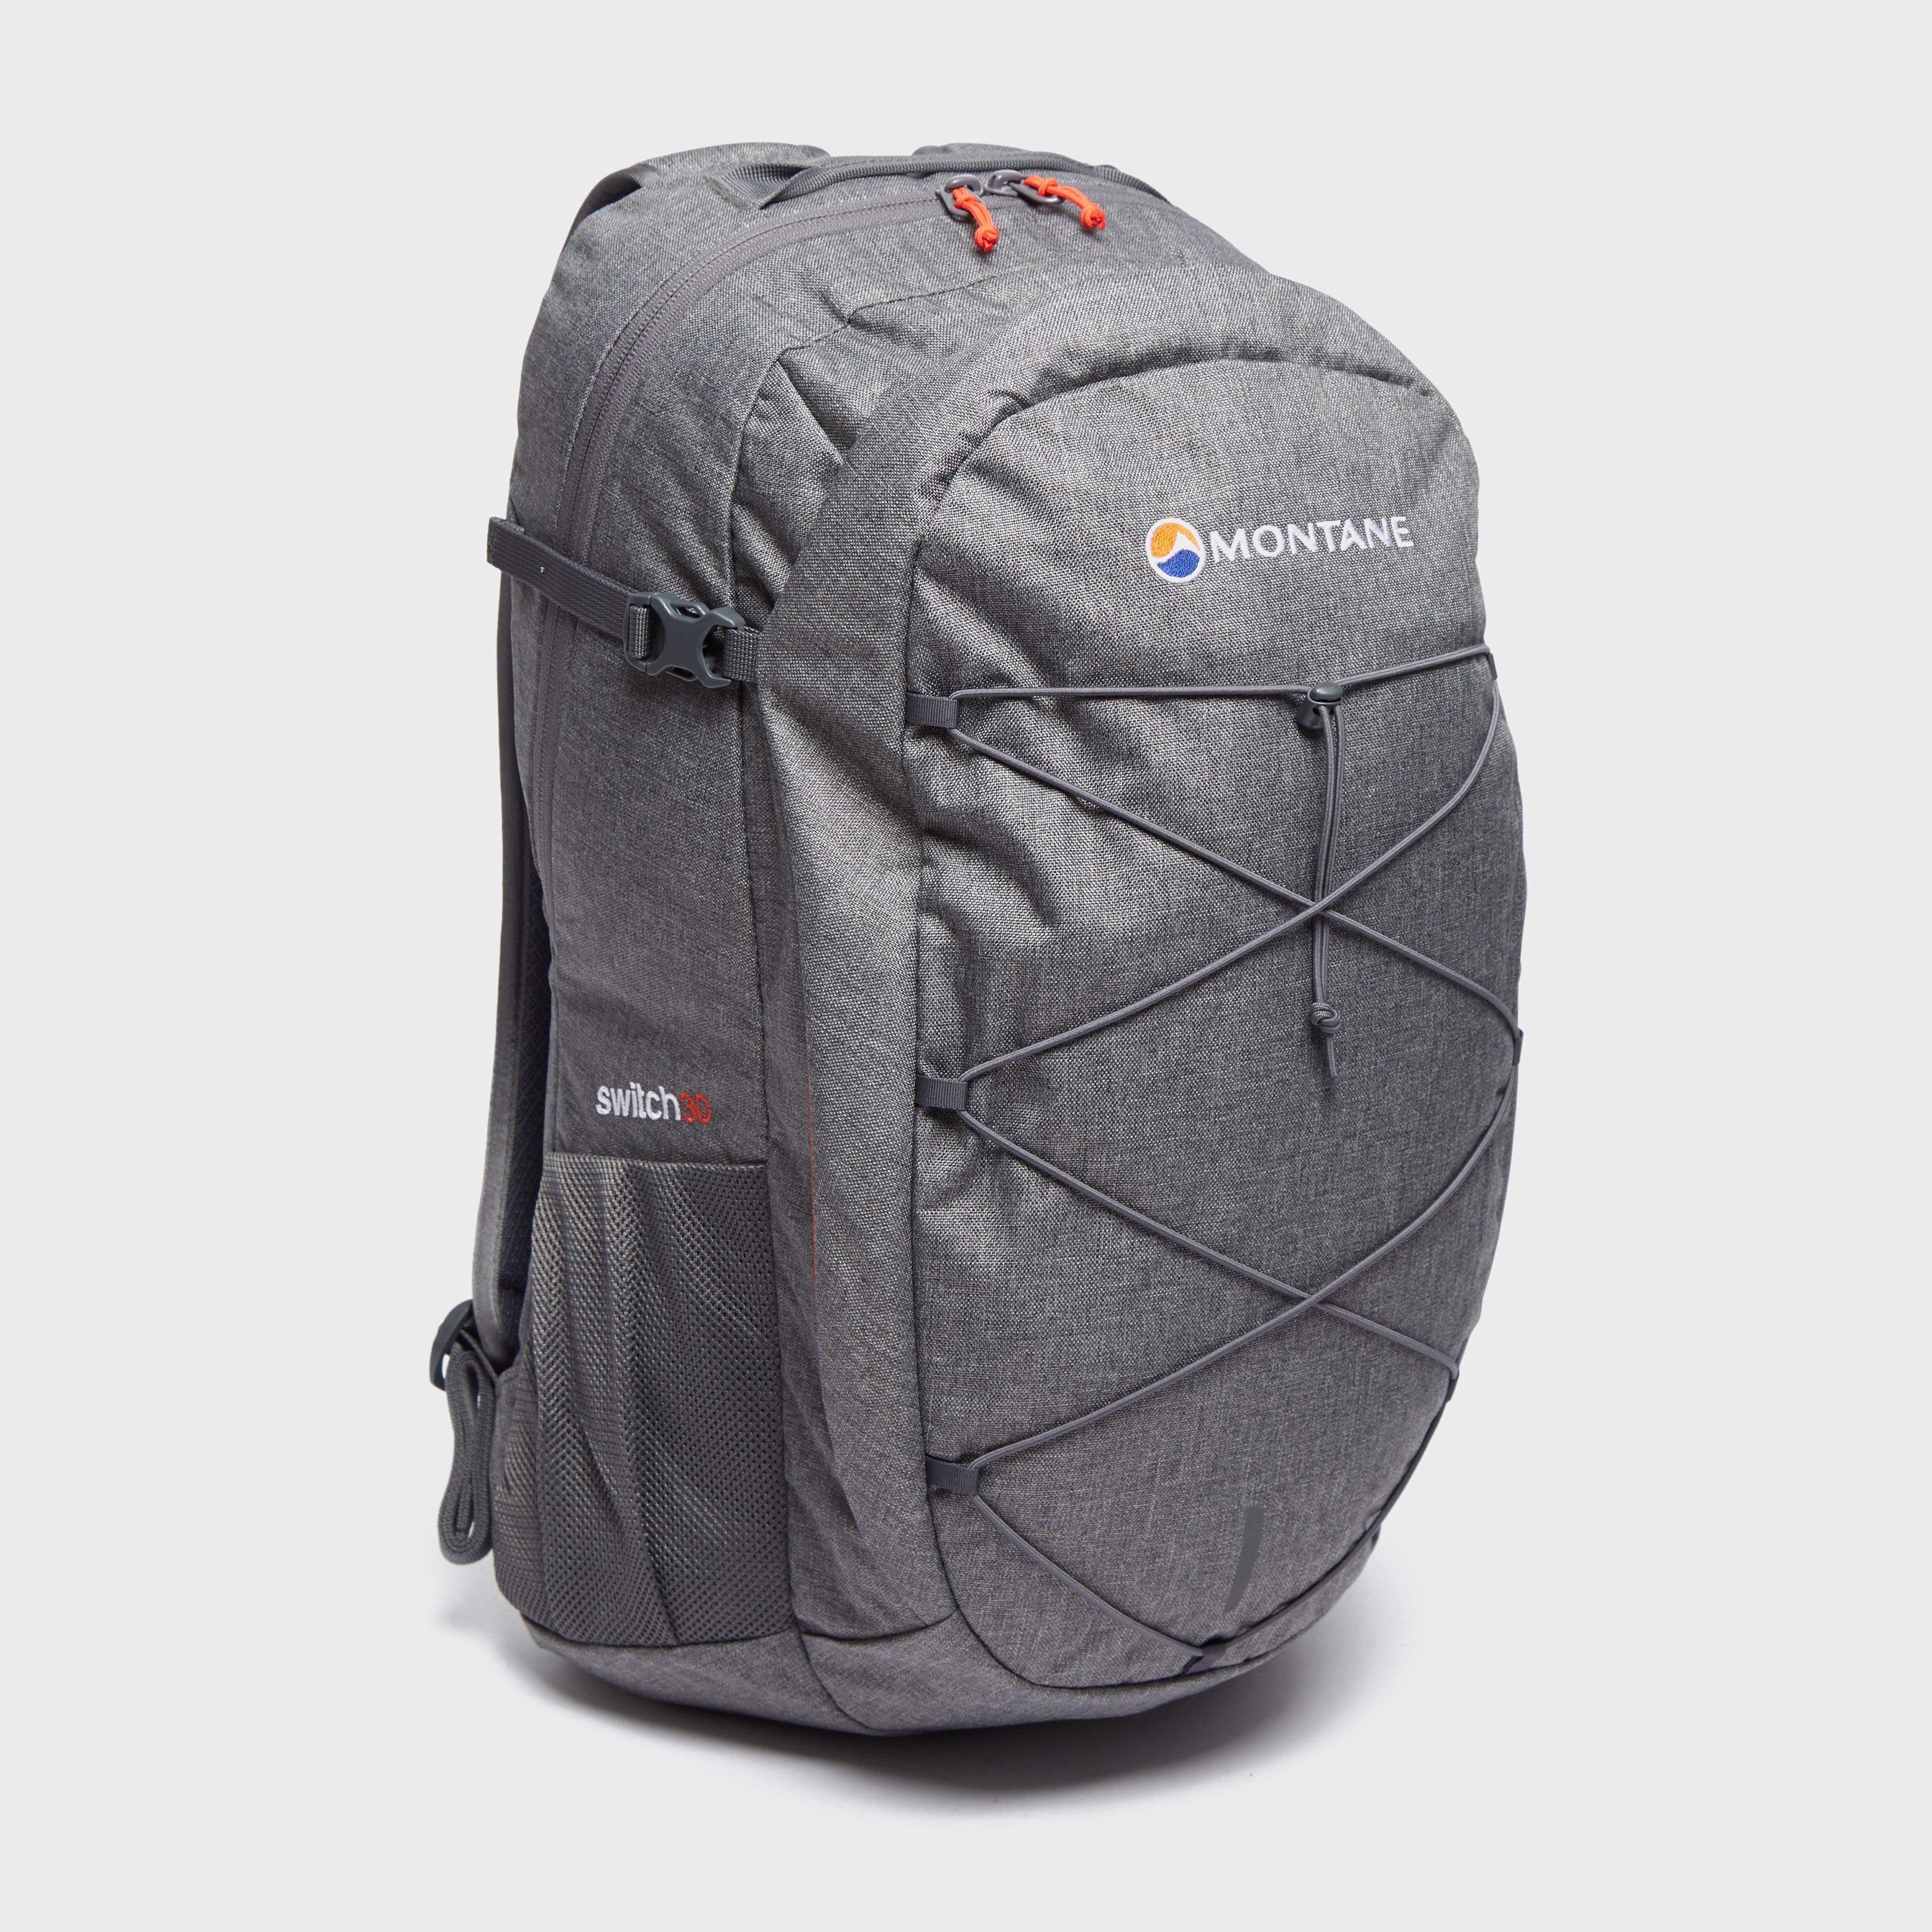 Montane Switch 30 Daypack, Grey